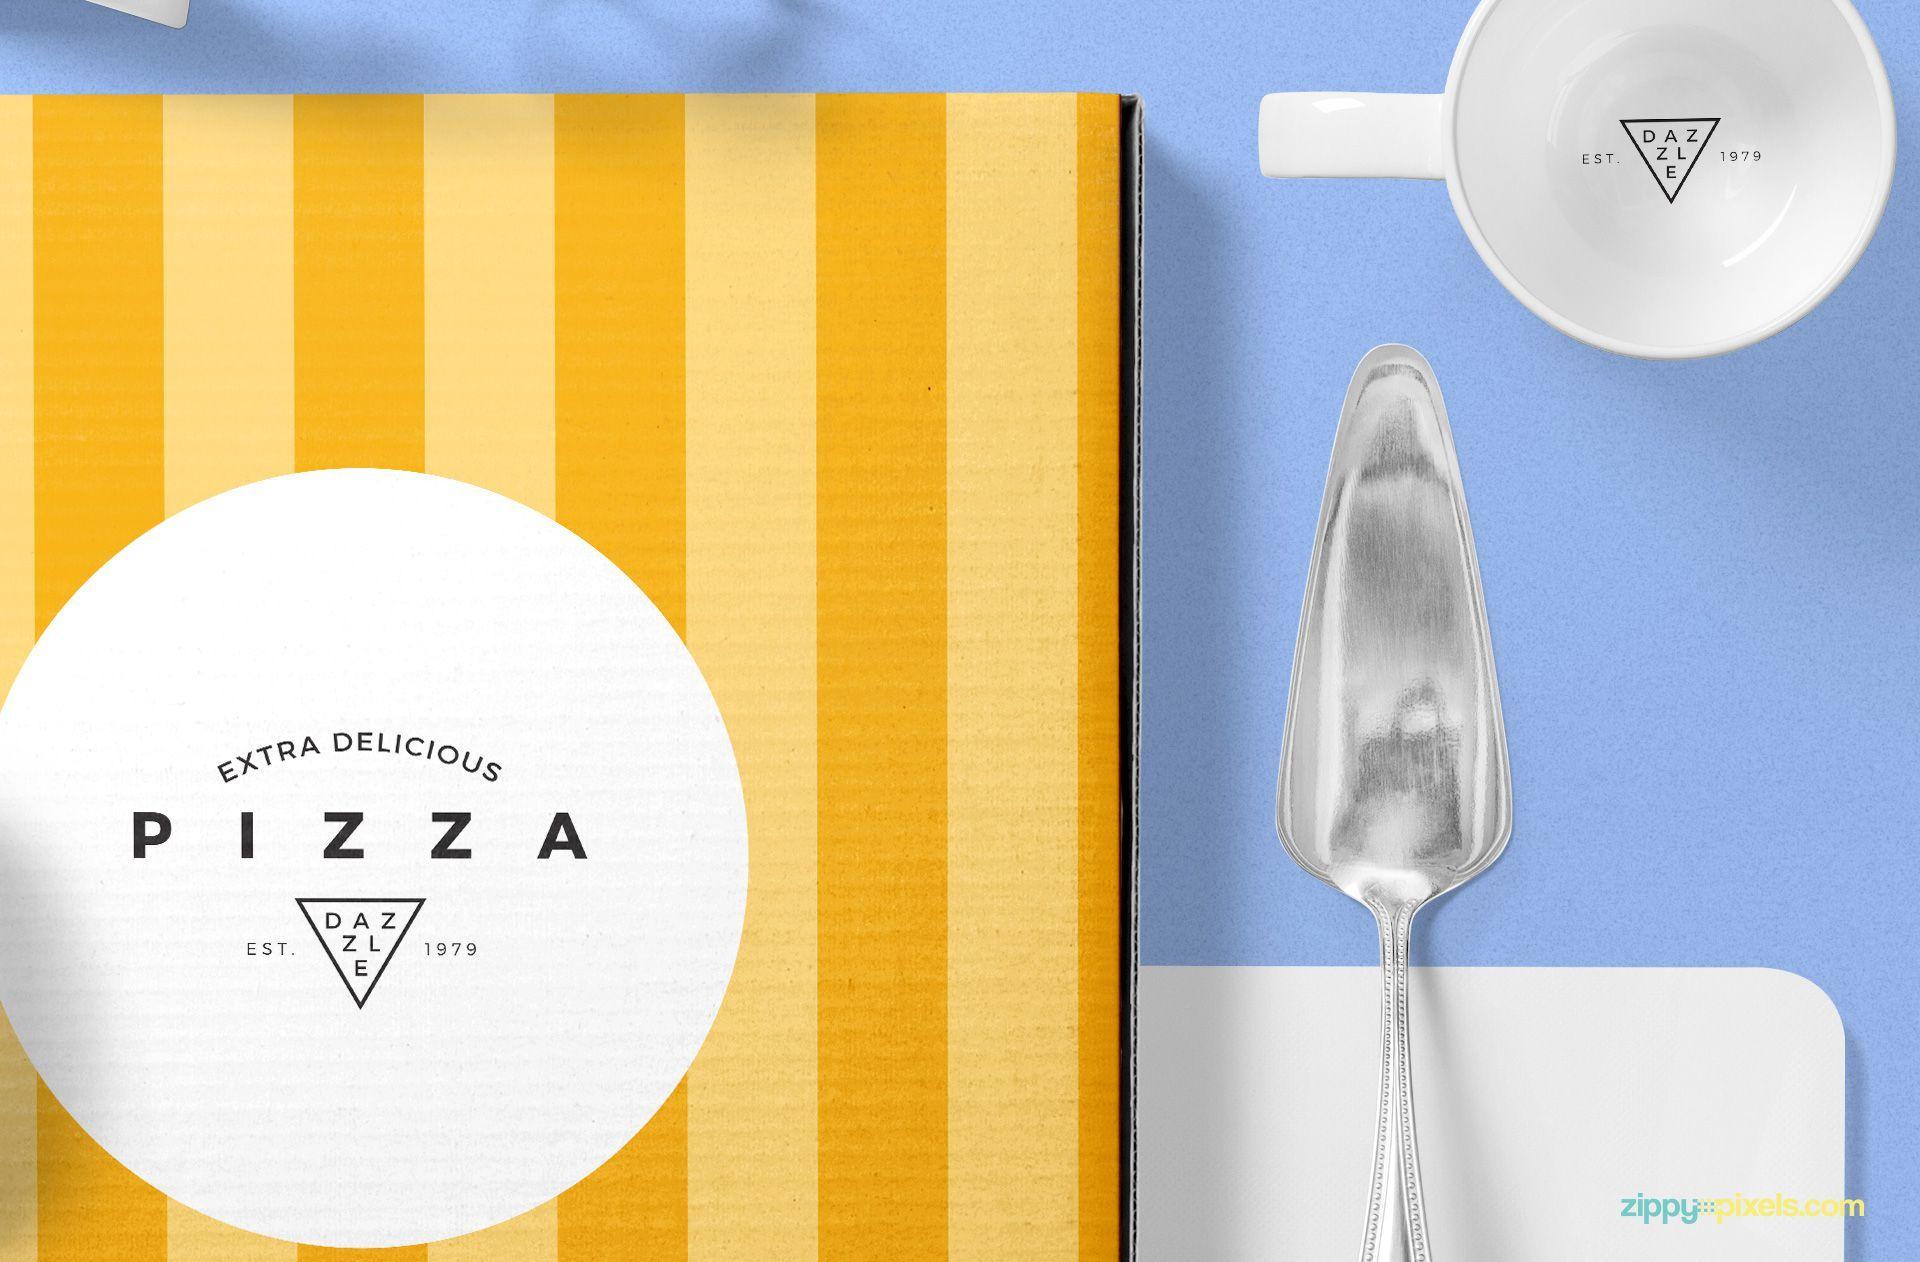 Download Pizza Packaging Mockup Free Psd Scene Zippypixels Psd Templates Mockup Free Psd Packaging Mockup